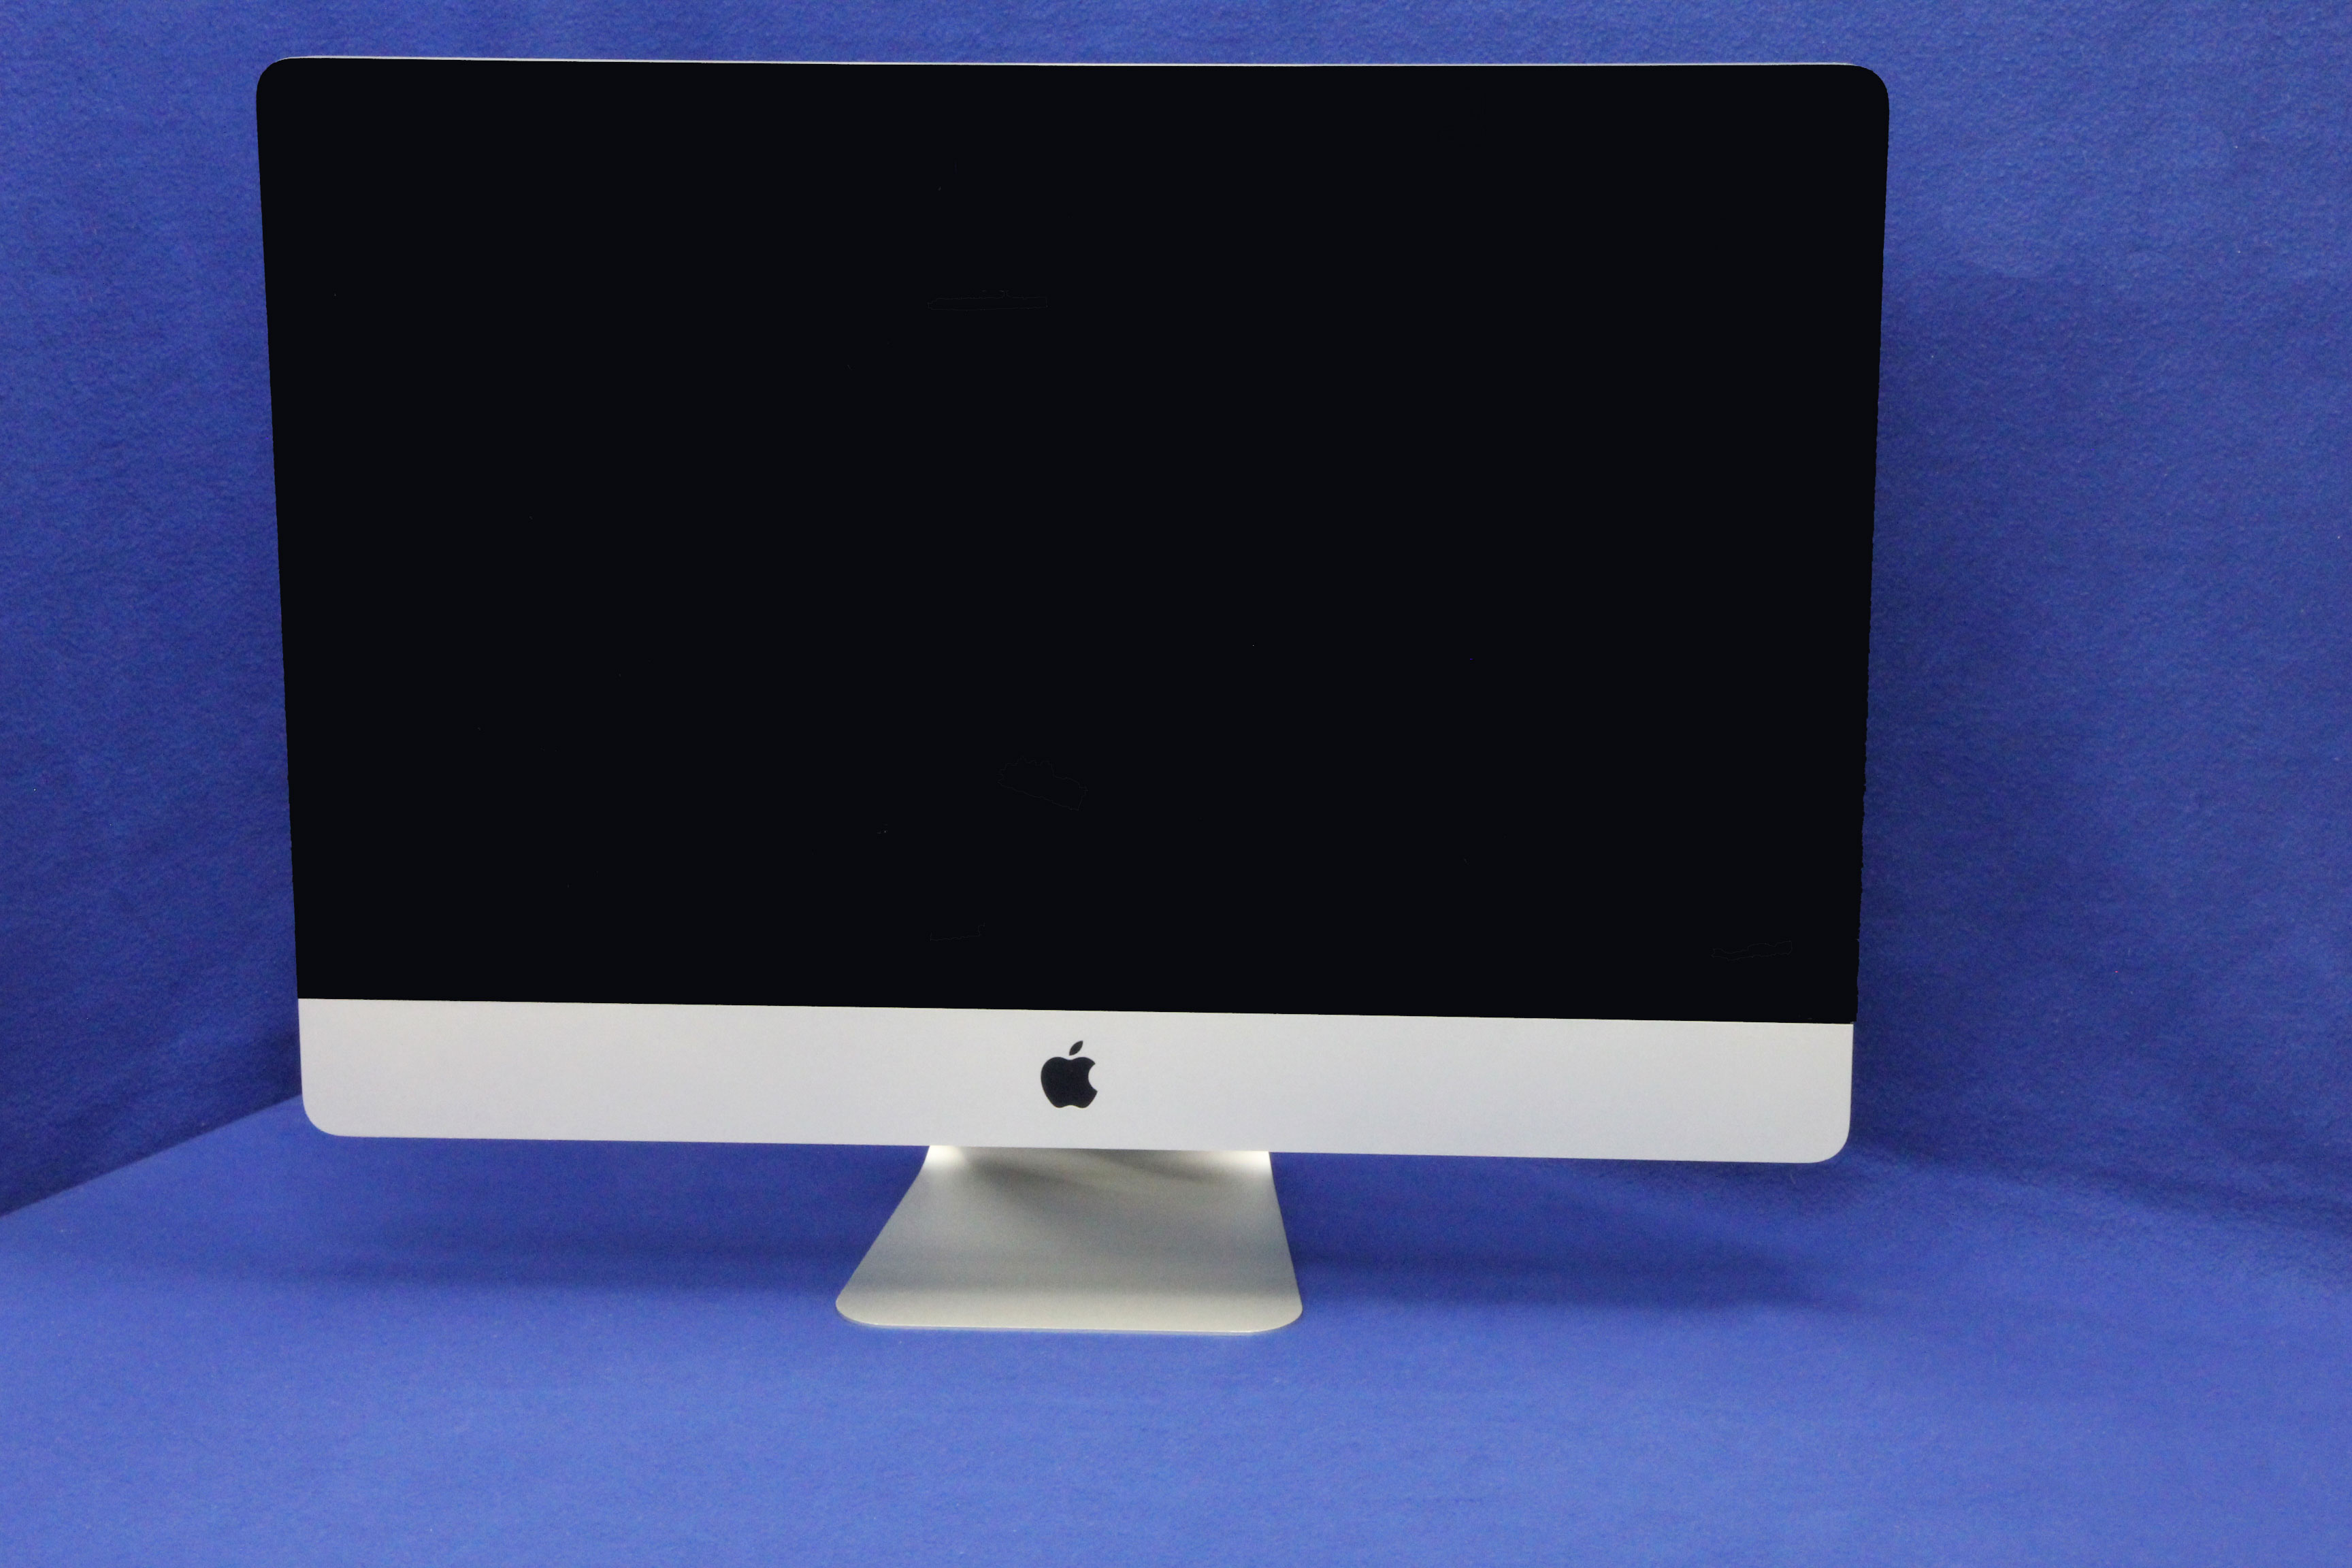 apple imac 27 3 4ghz i7 12 gb 1tb hdd ati hd 6970. Black Bedroom Furniture Sets. Home Design Ideas